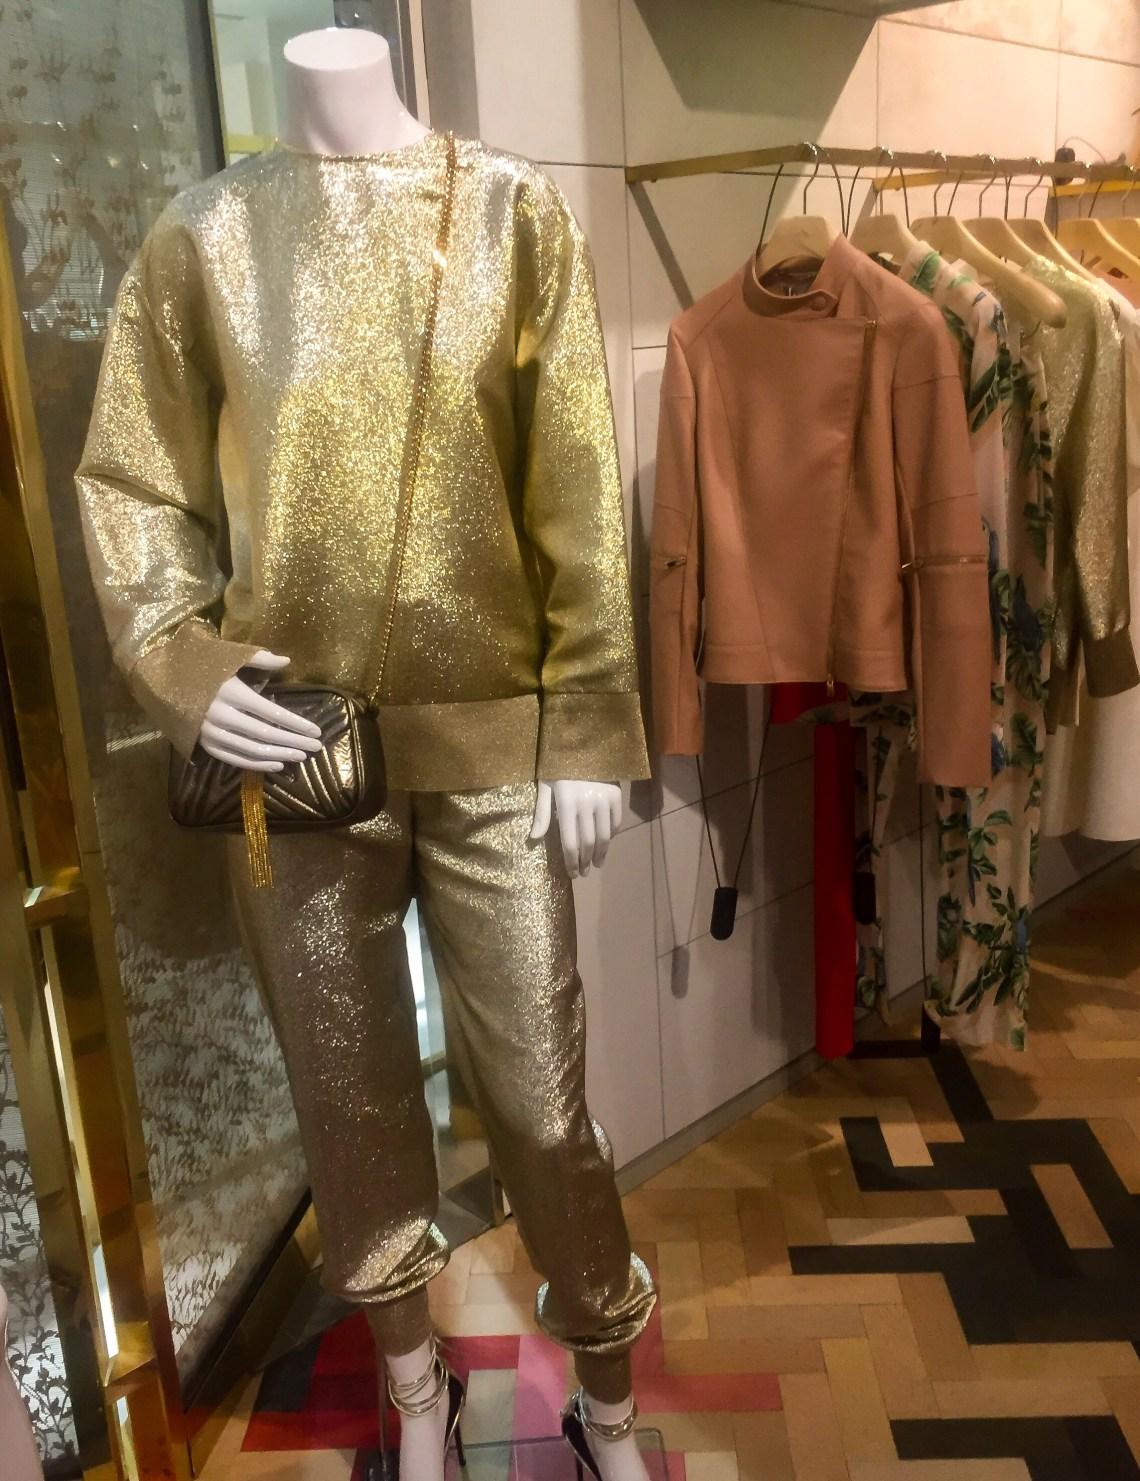 paris-fashion-salg-bodilfuhr-no